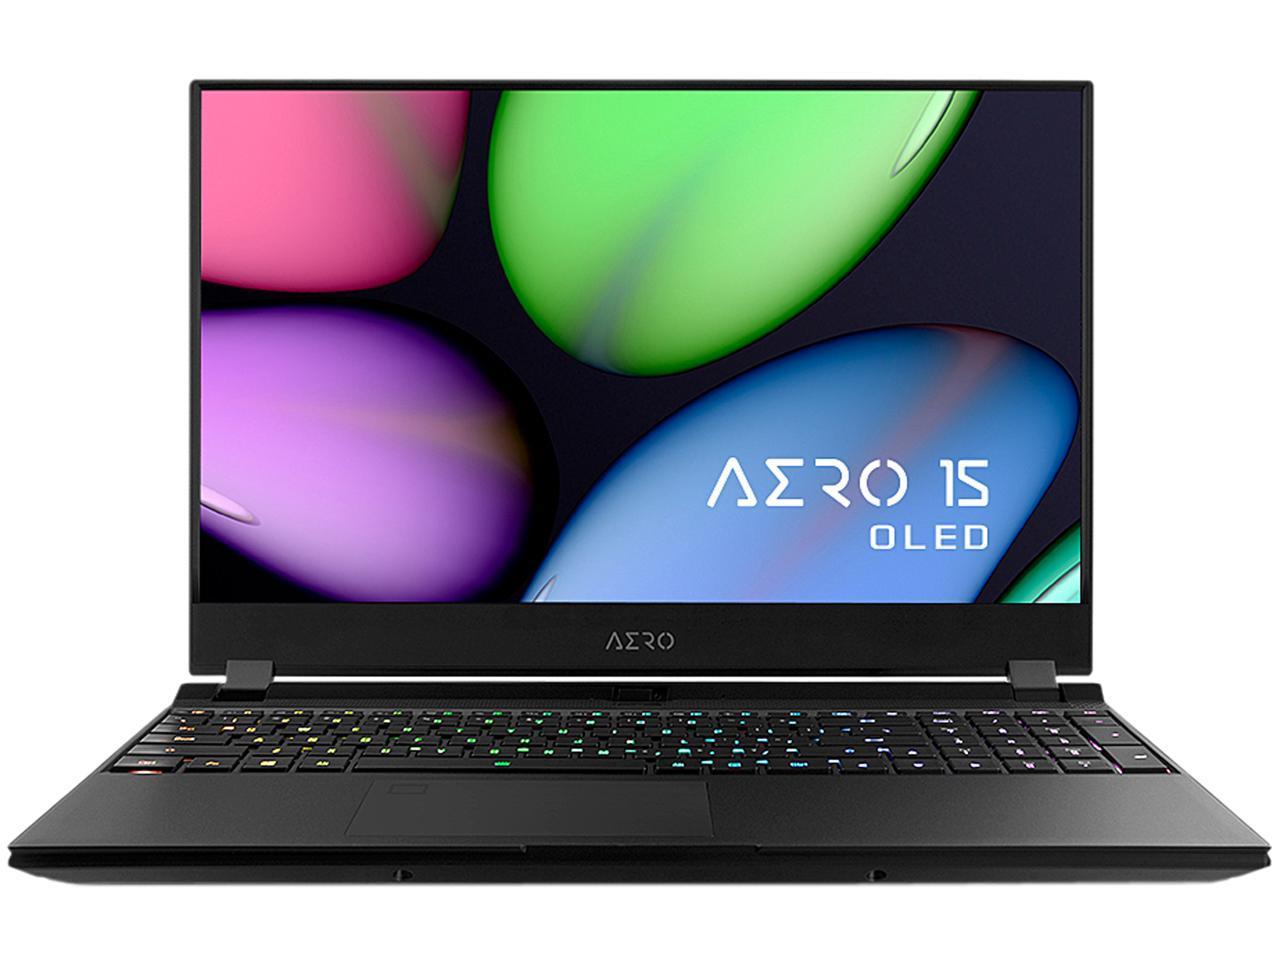 GIGABYTE - AERO 15 OLED SA-7US5020SH Gaming Laptop - 15.6 4K UHD AMOLED - Intel Core i7-9750H - NVIDIA GeForce GTX 1660 Ti - 8 GB Memory 256 GB SSD $1329